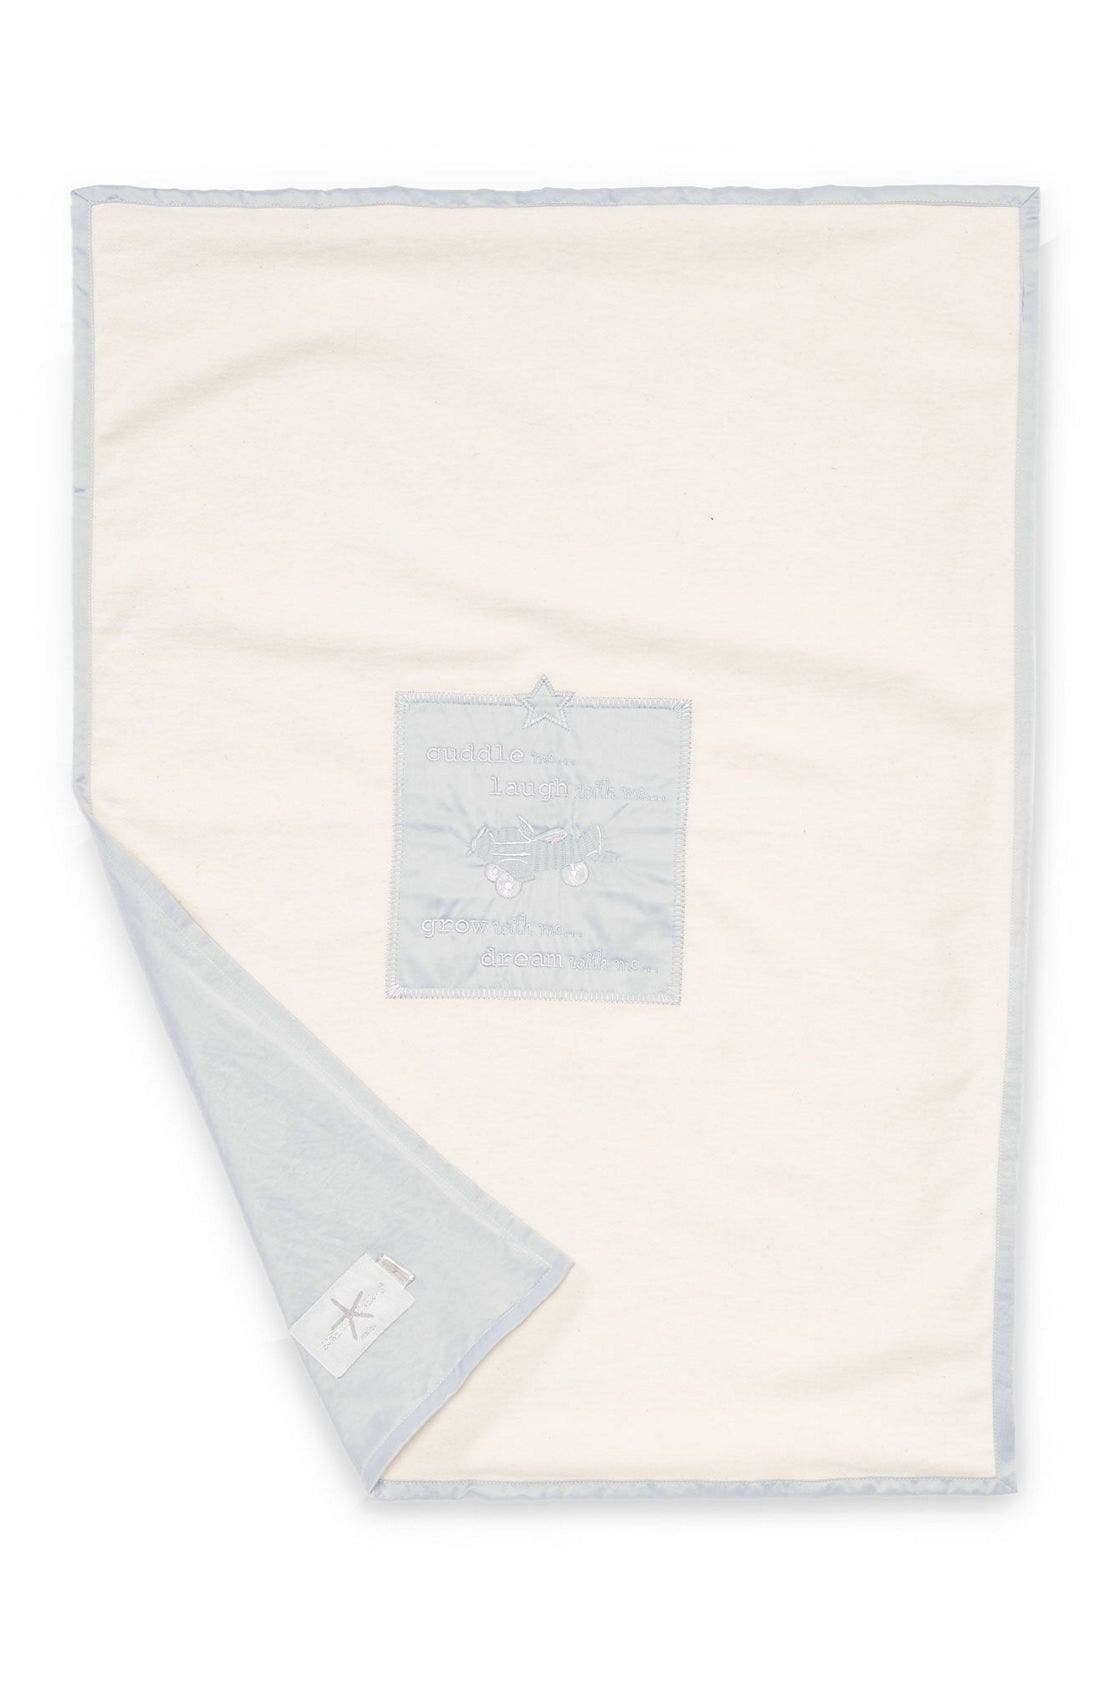 Alternate Image 1 Selected - Barefoot Dreams® Signature Receiving Blanket